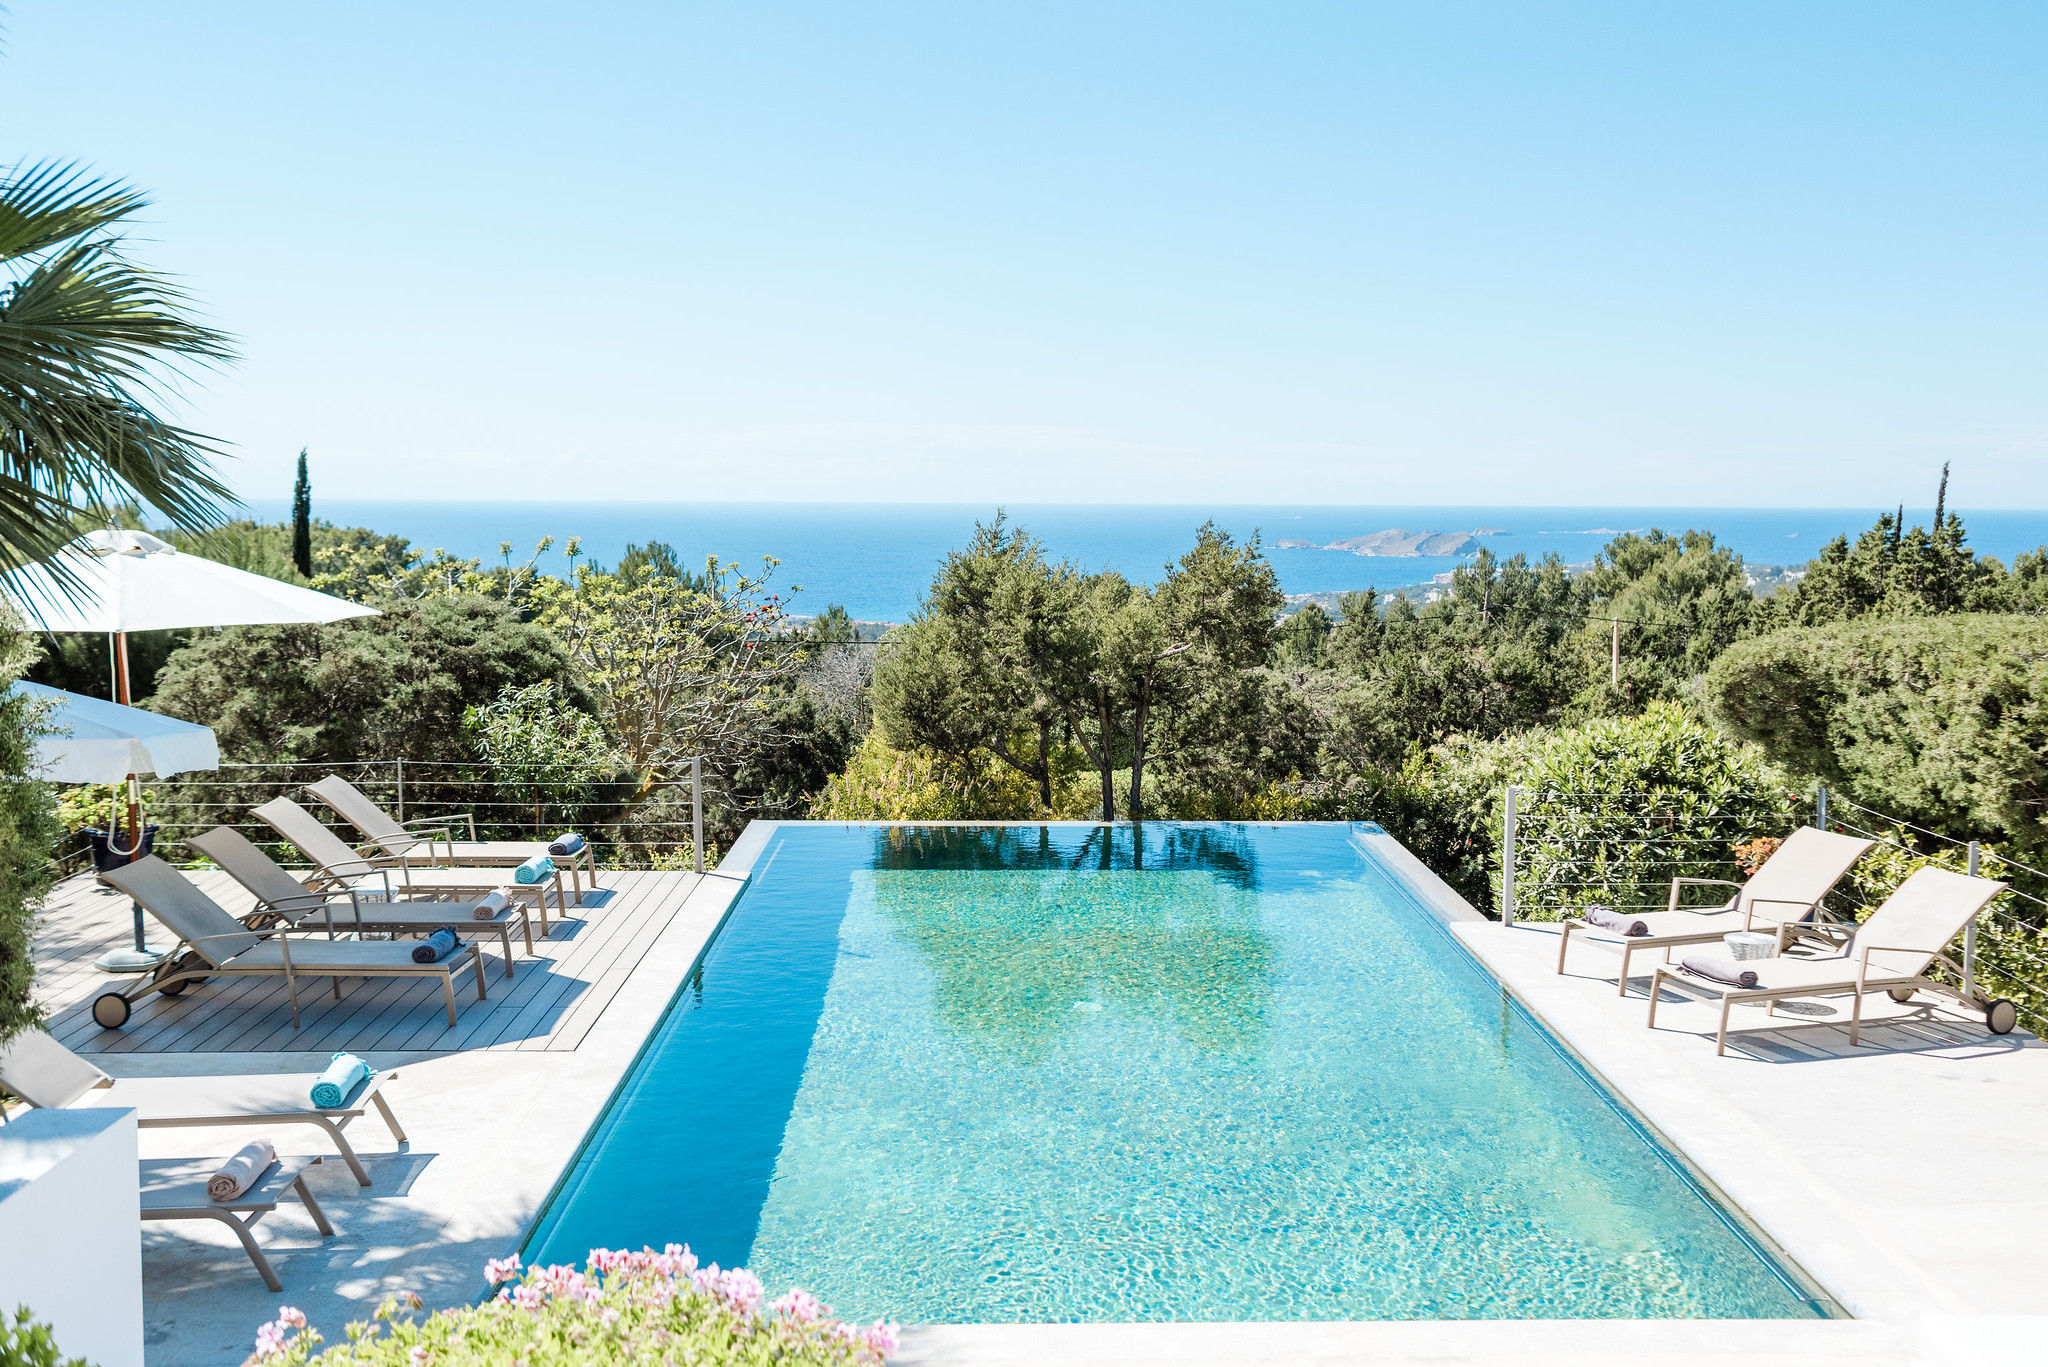 https://www.white-ibiza.com/wp-content/uploads/2020/06/white-ibiza-villas-casa-nyah-exterior-pool-view4.jpg